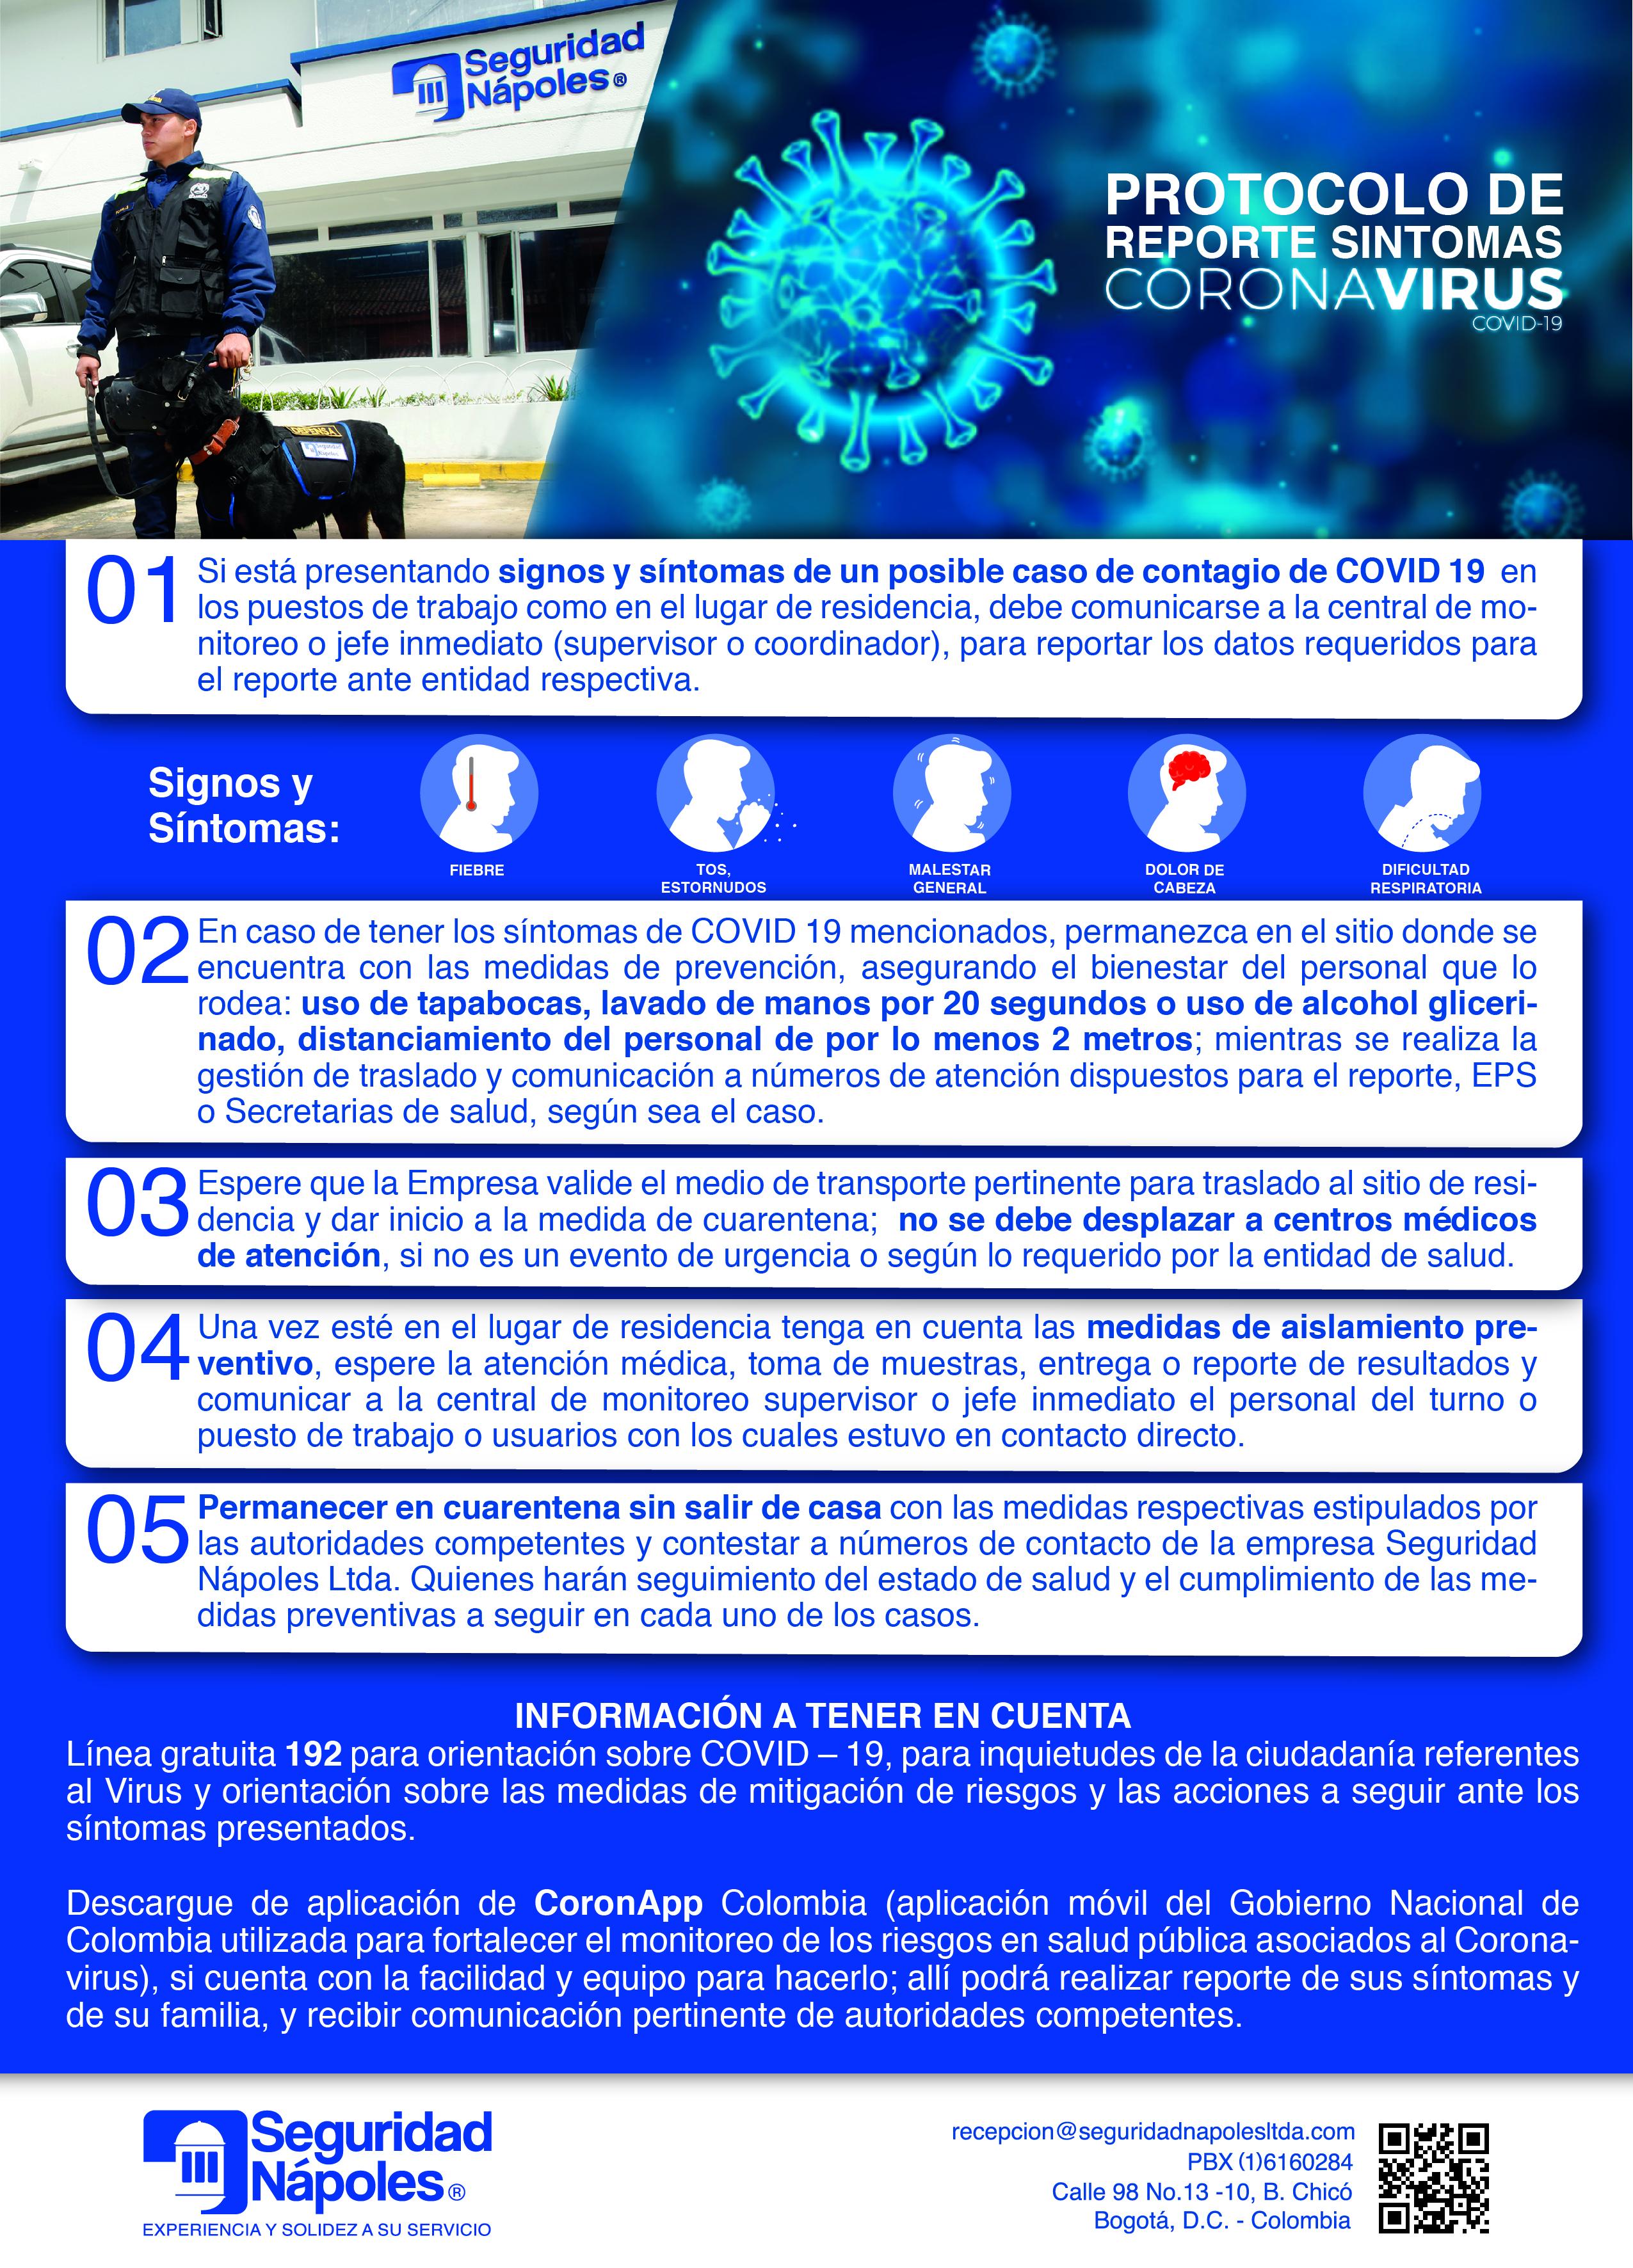 Protocolo de reporte síntomas coronavirus covid-19.